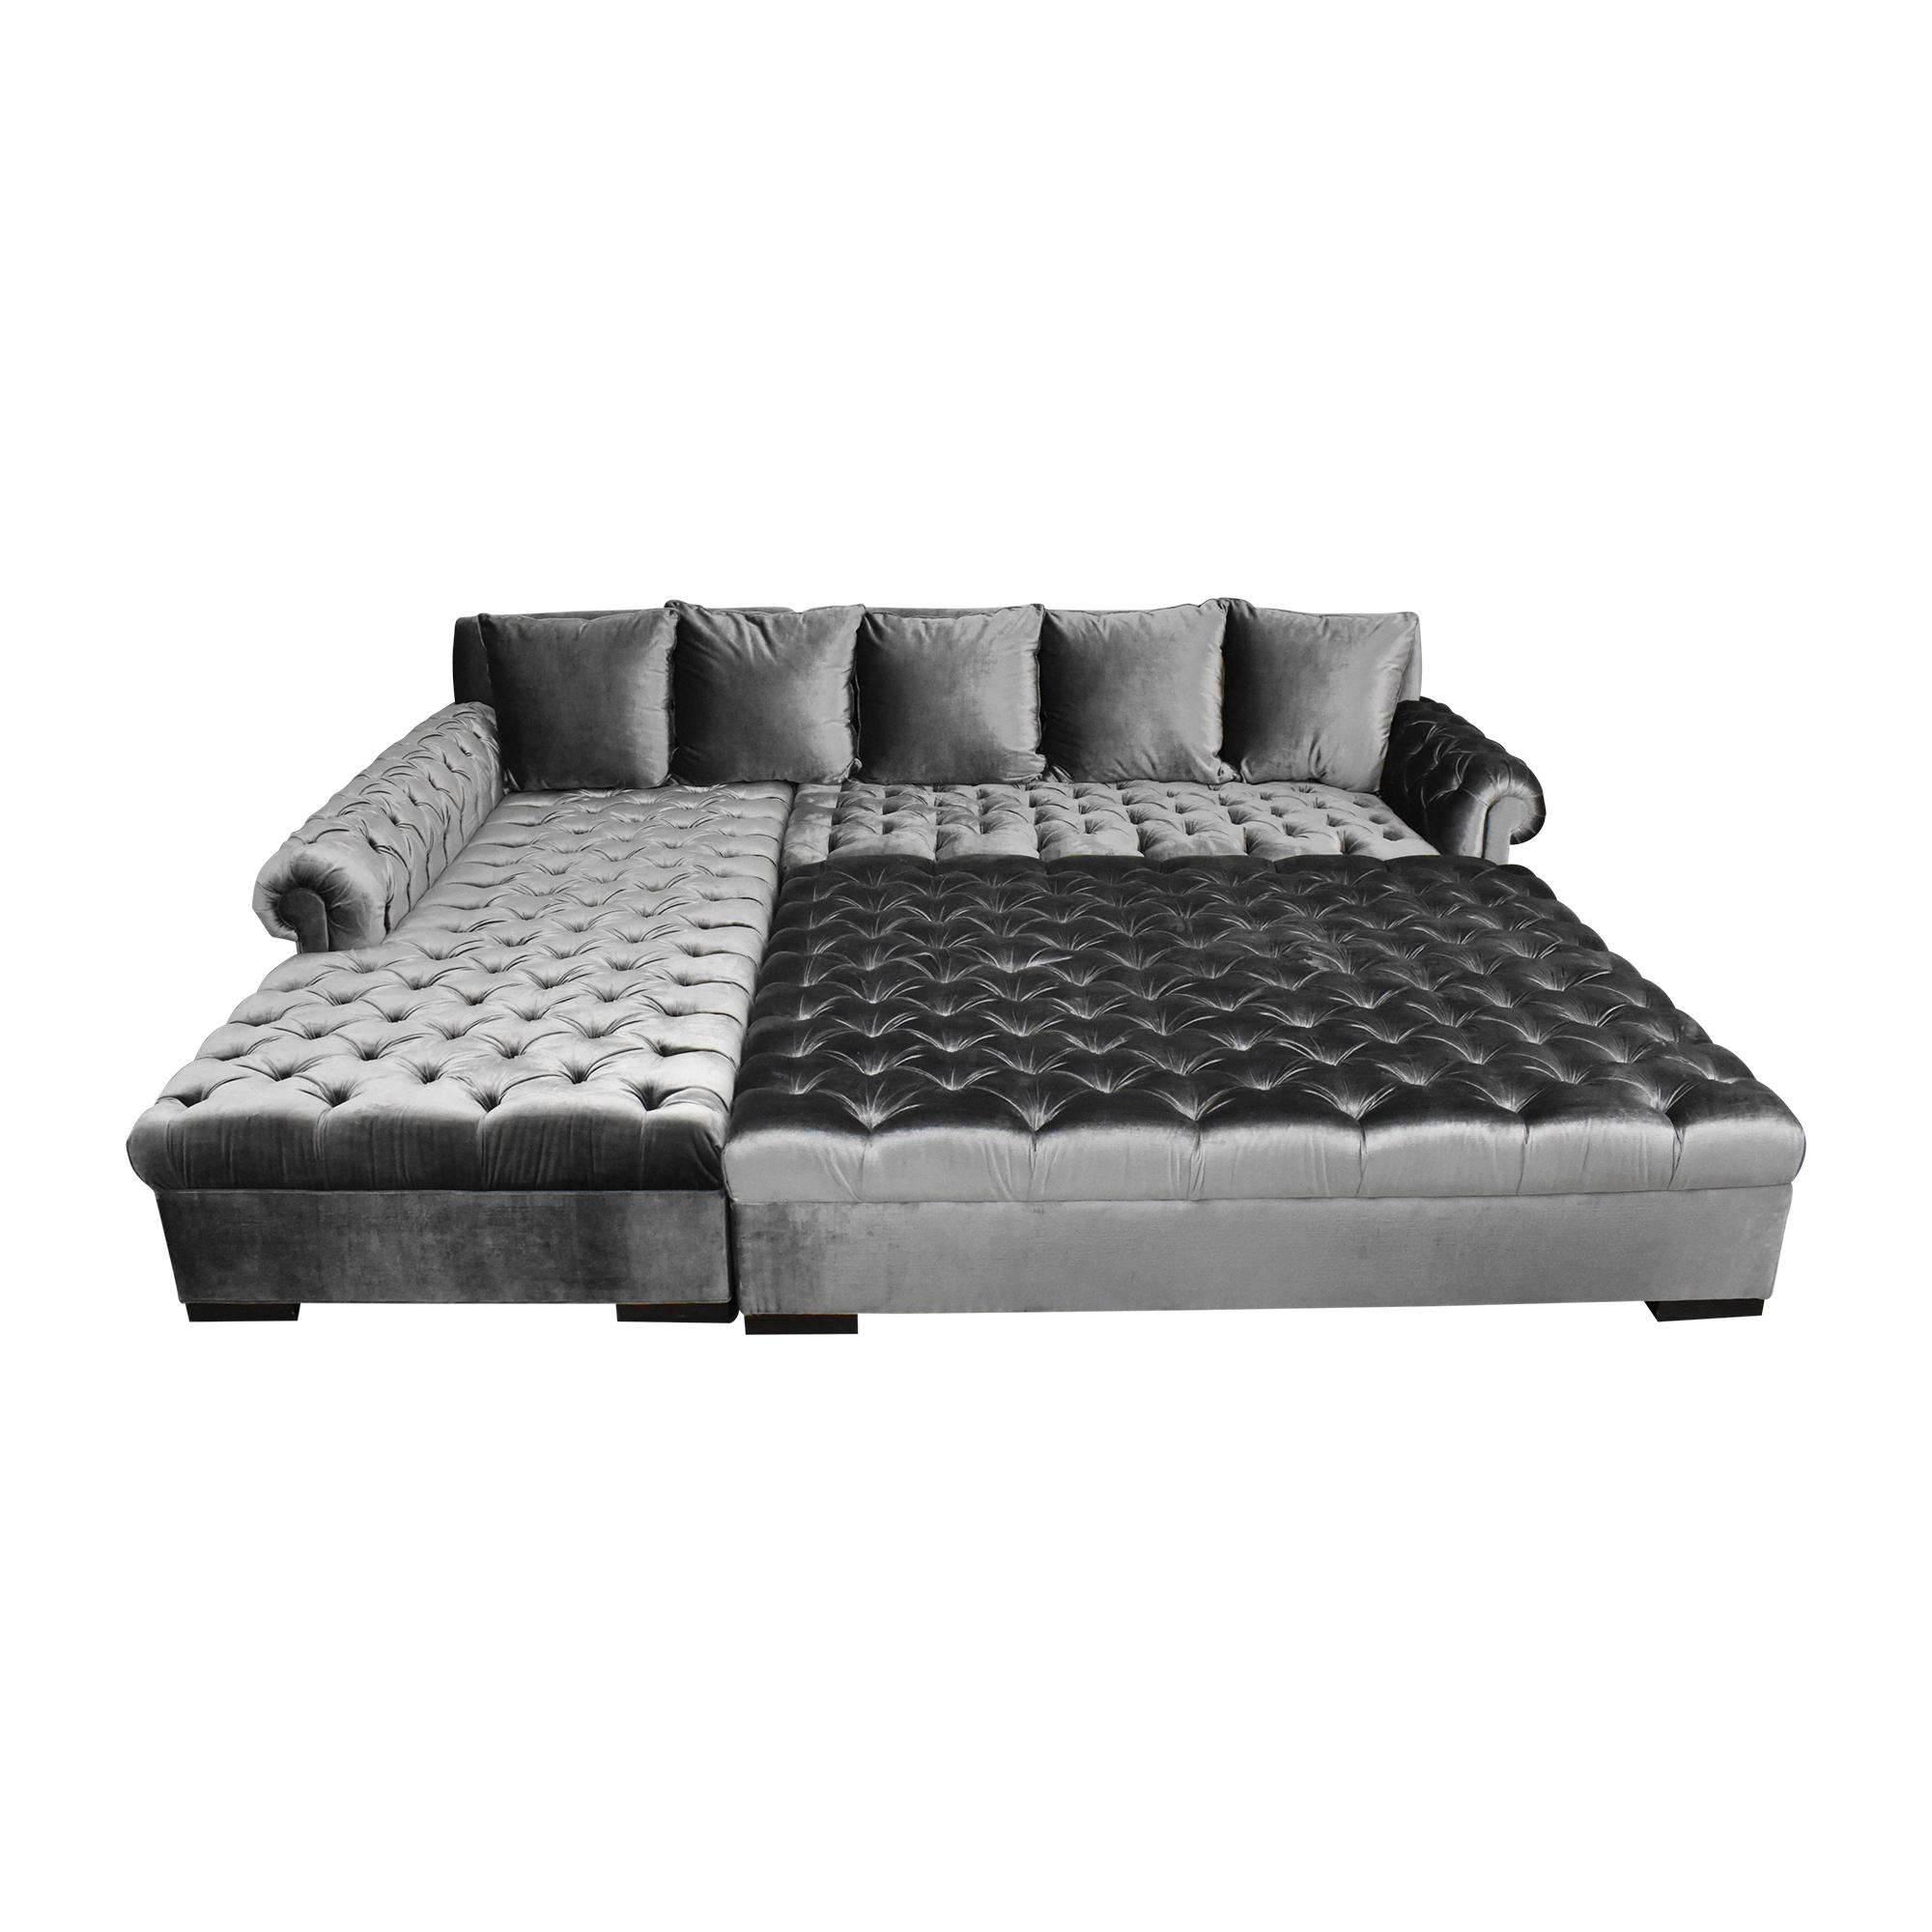 buy Haute House Smith Sectional Sofa with Ottoman Haute House